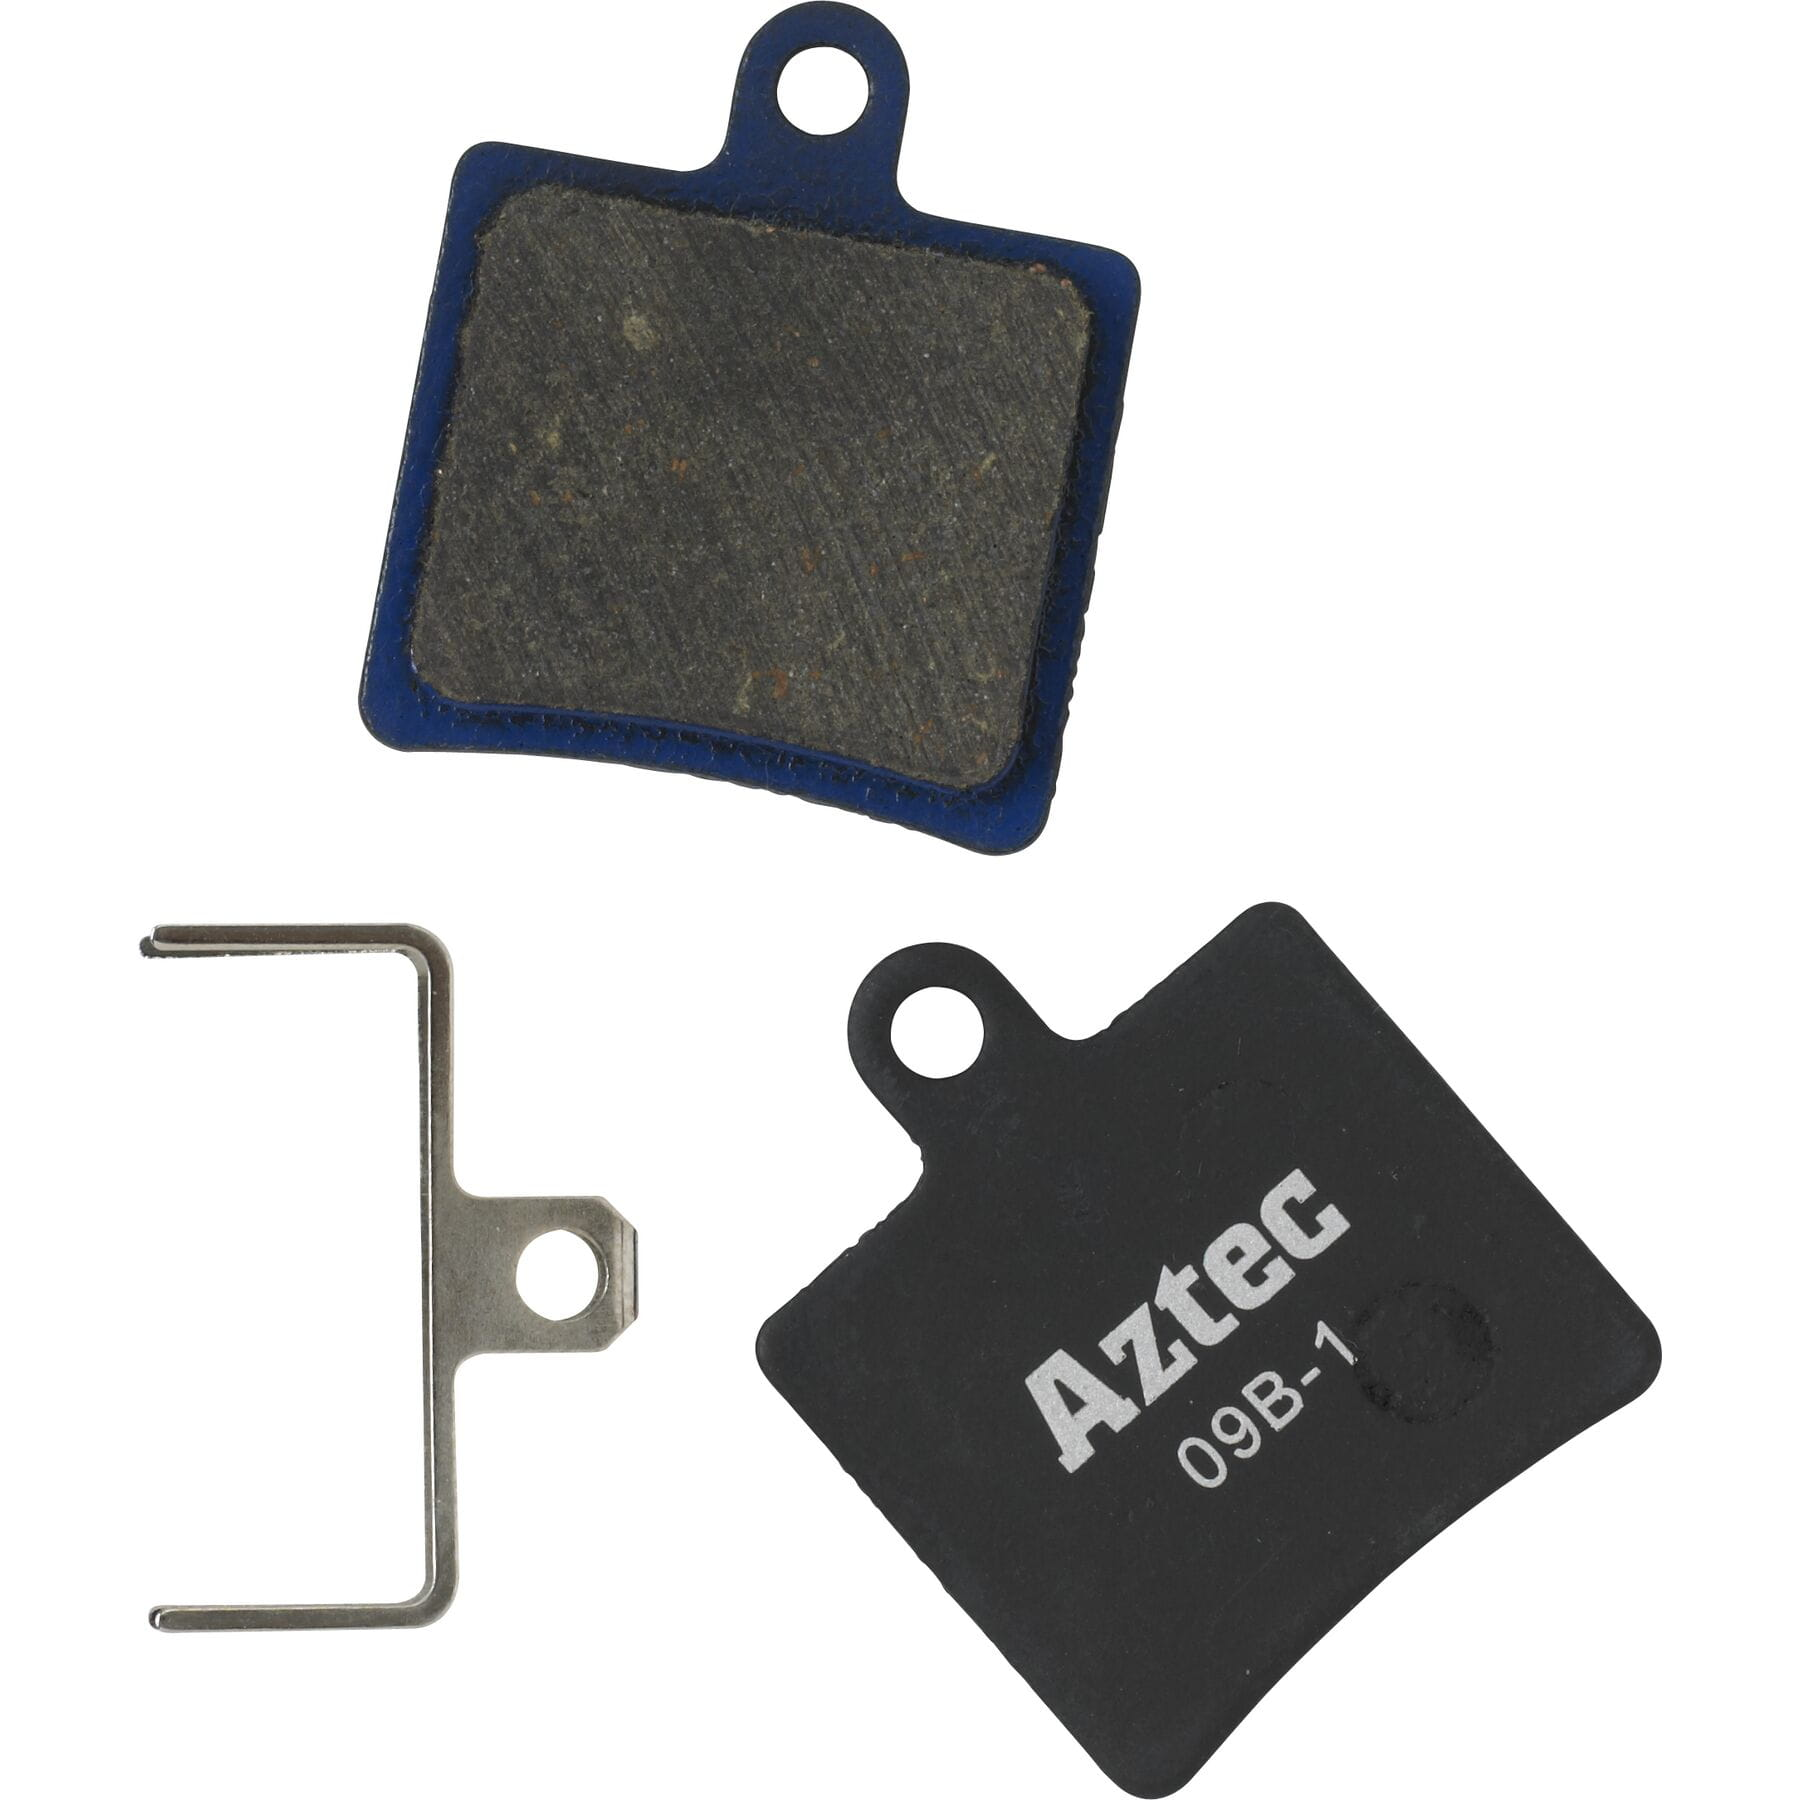 Aztec Organic disc brake pads for Hope Mini callipers